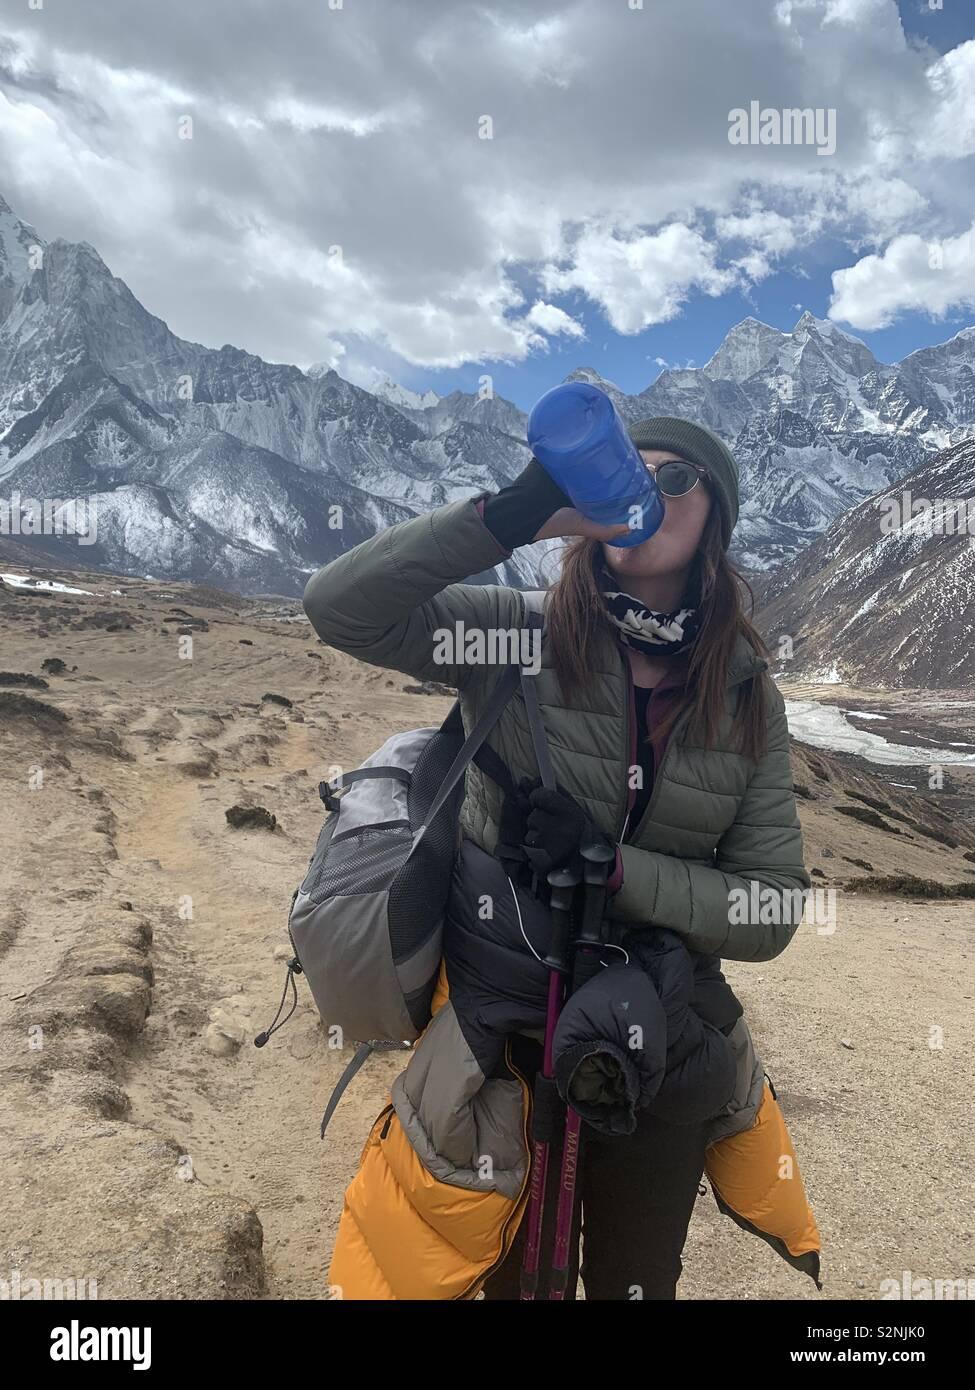 Everest base camp trek - Stock Image